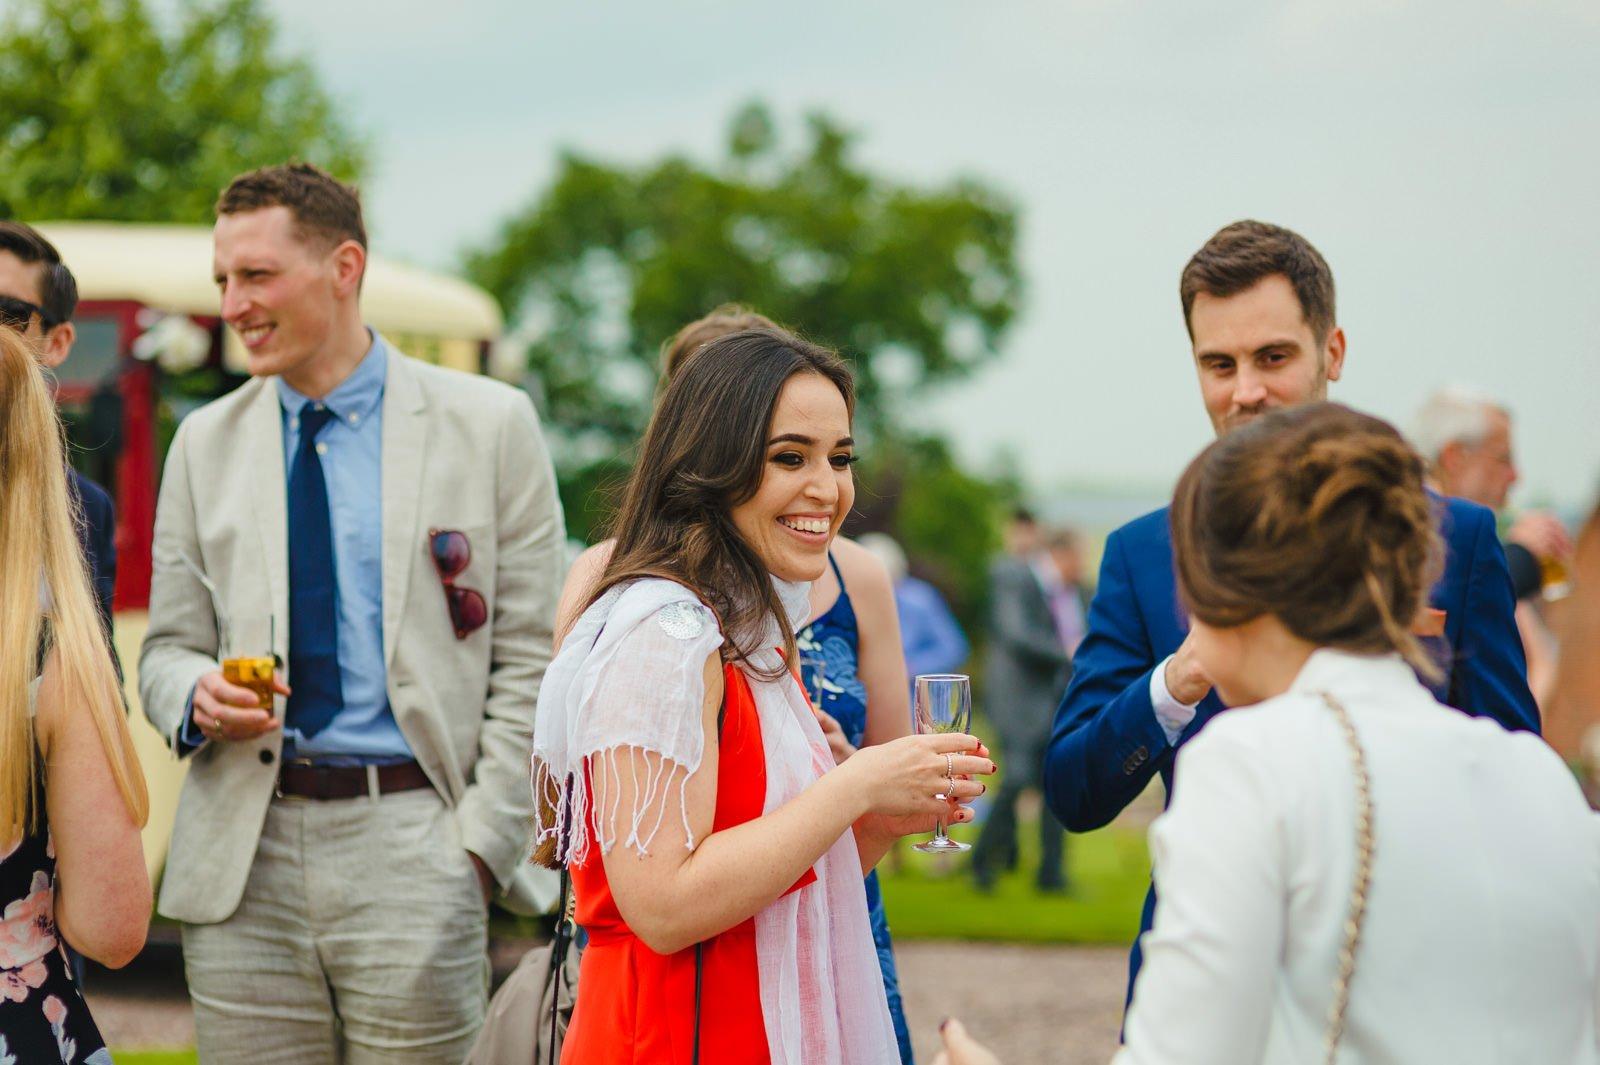 Millers Of Netley wedding, Dorrington, Shrewsbury | Emma + Ben 51